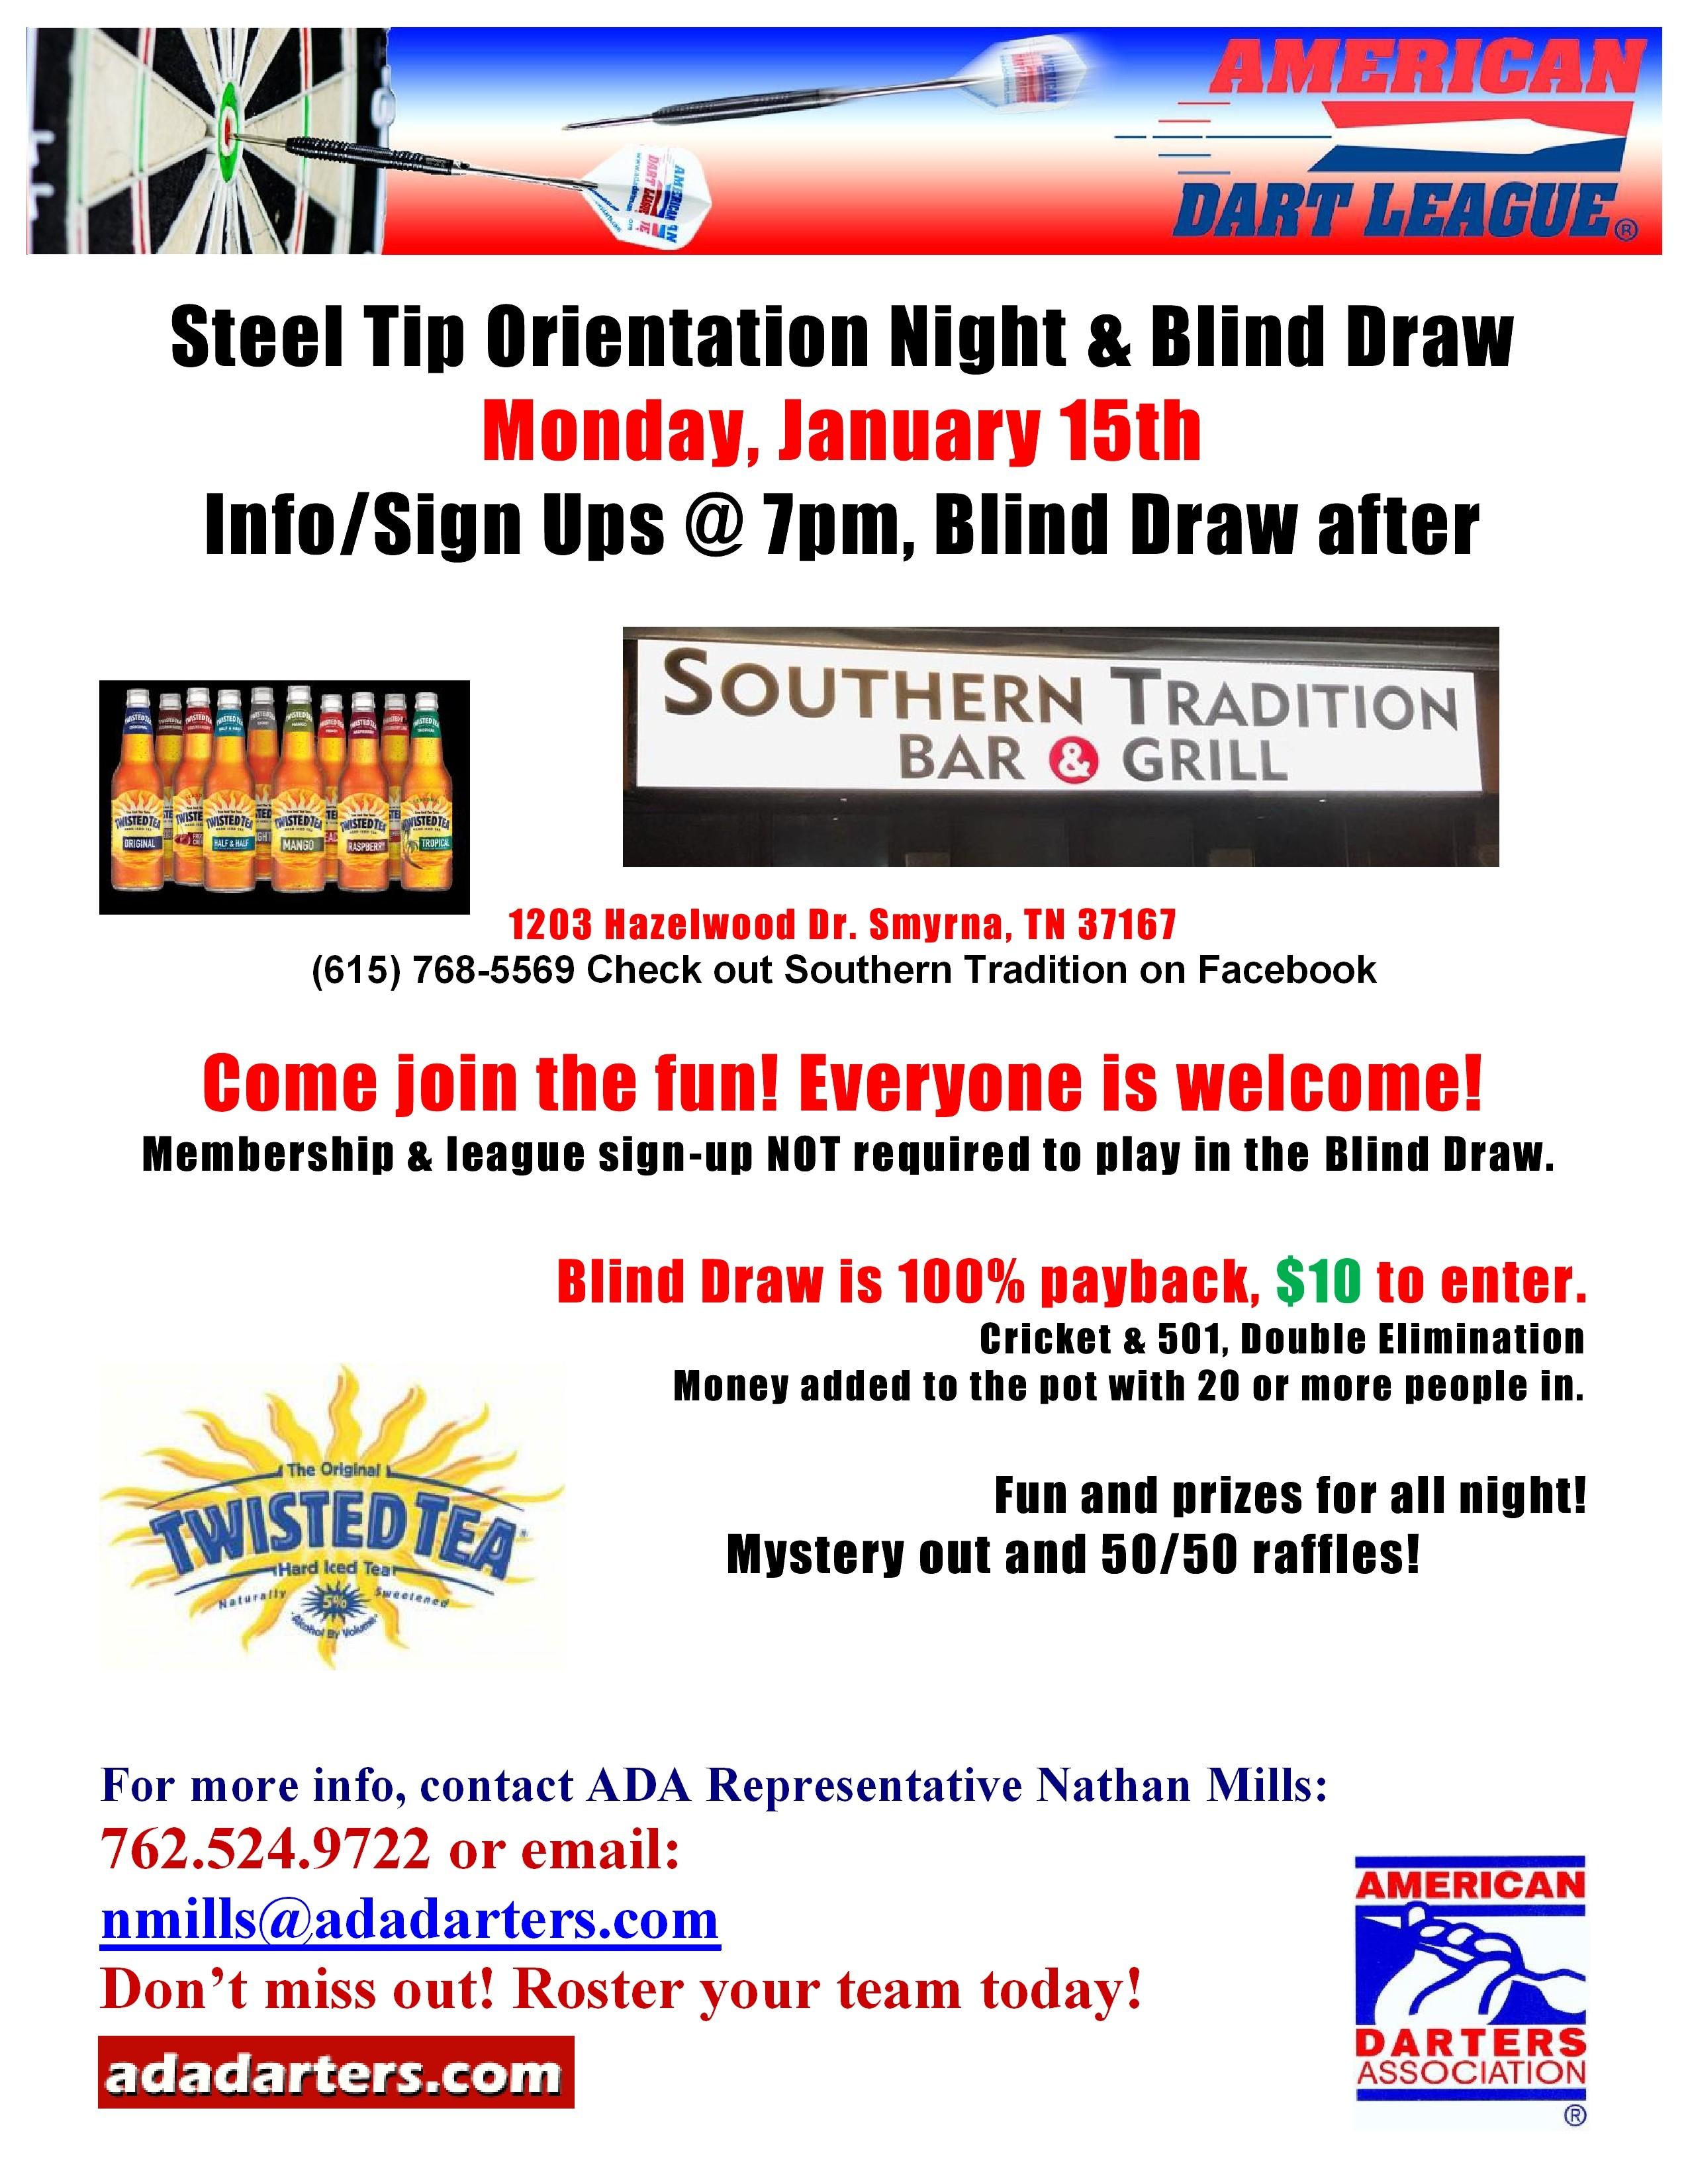 Steel Tip League Orientation & Blind Draw - ADA Area 371